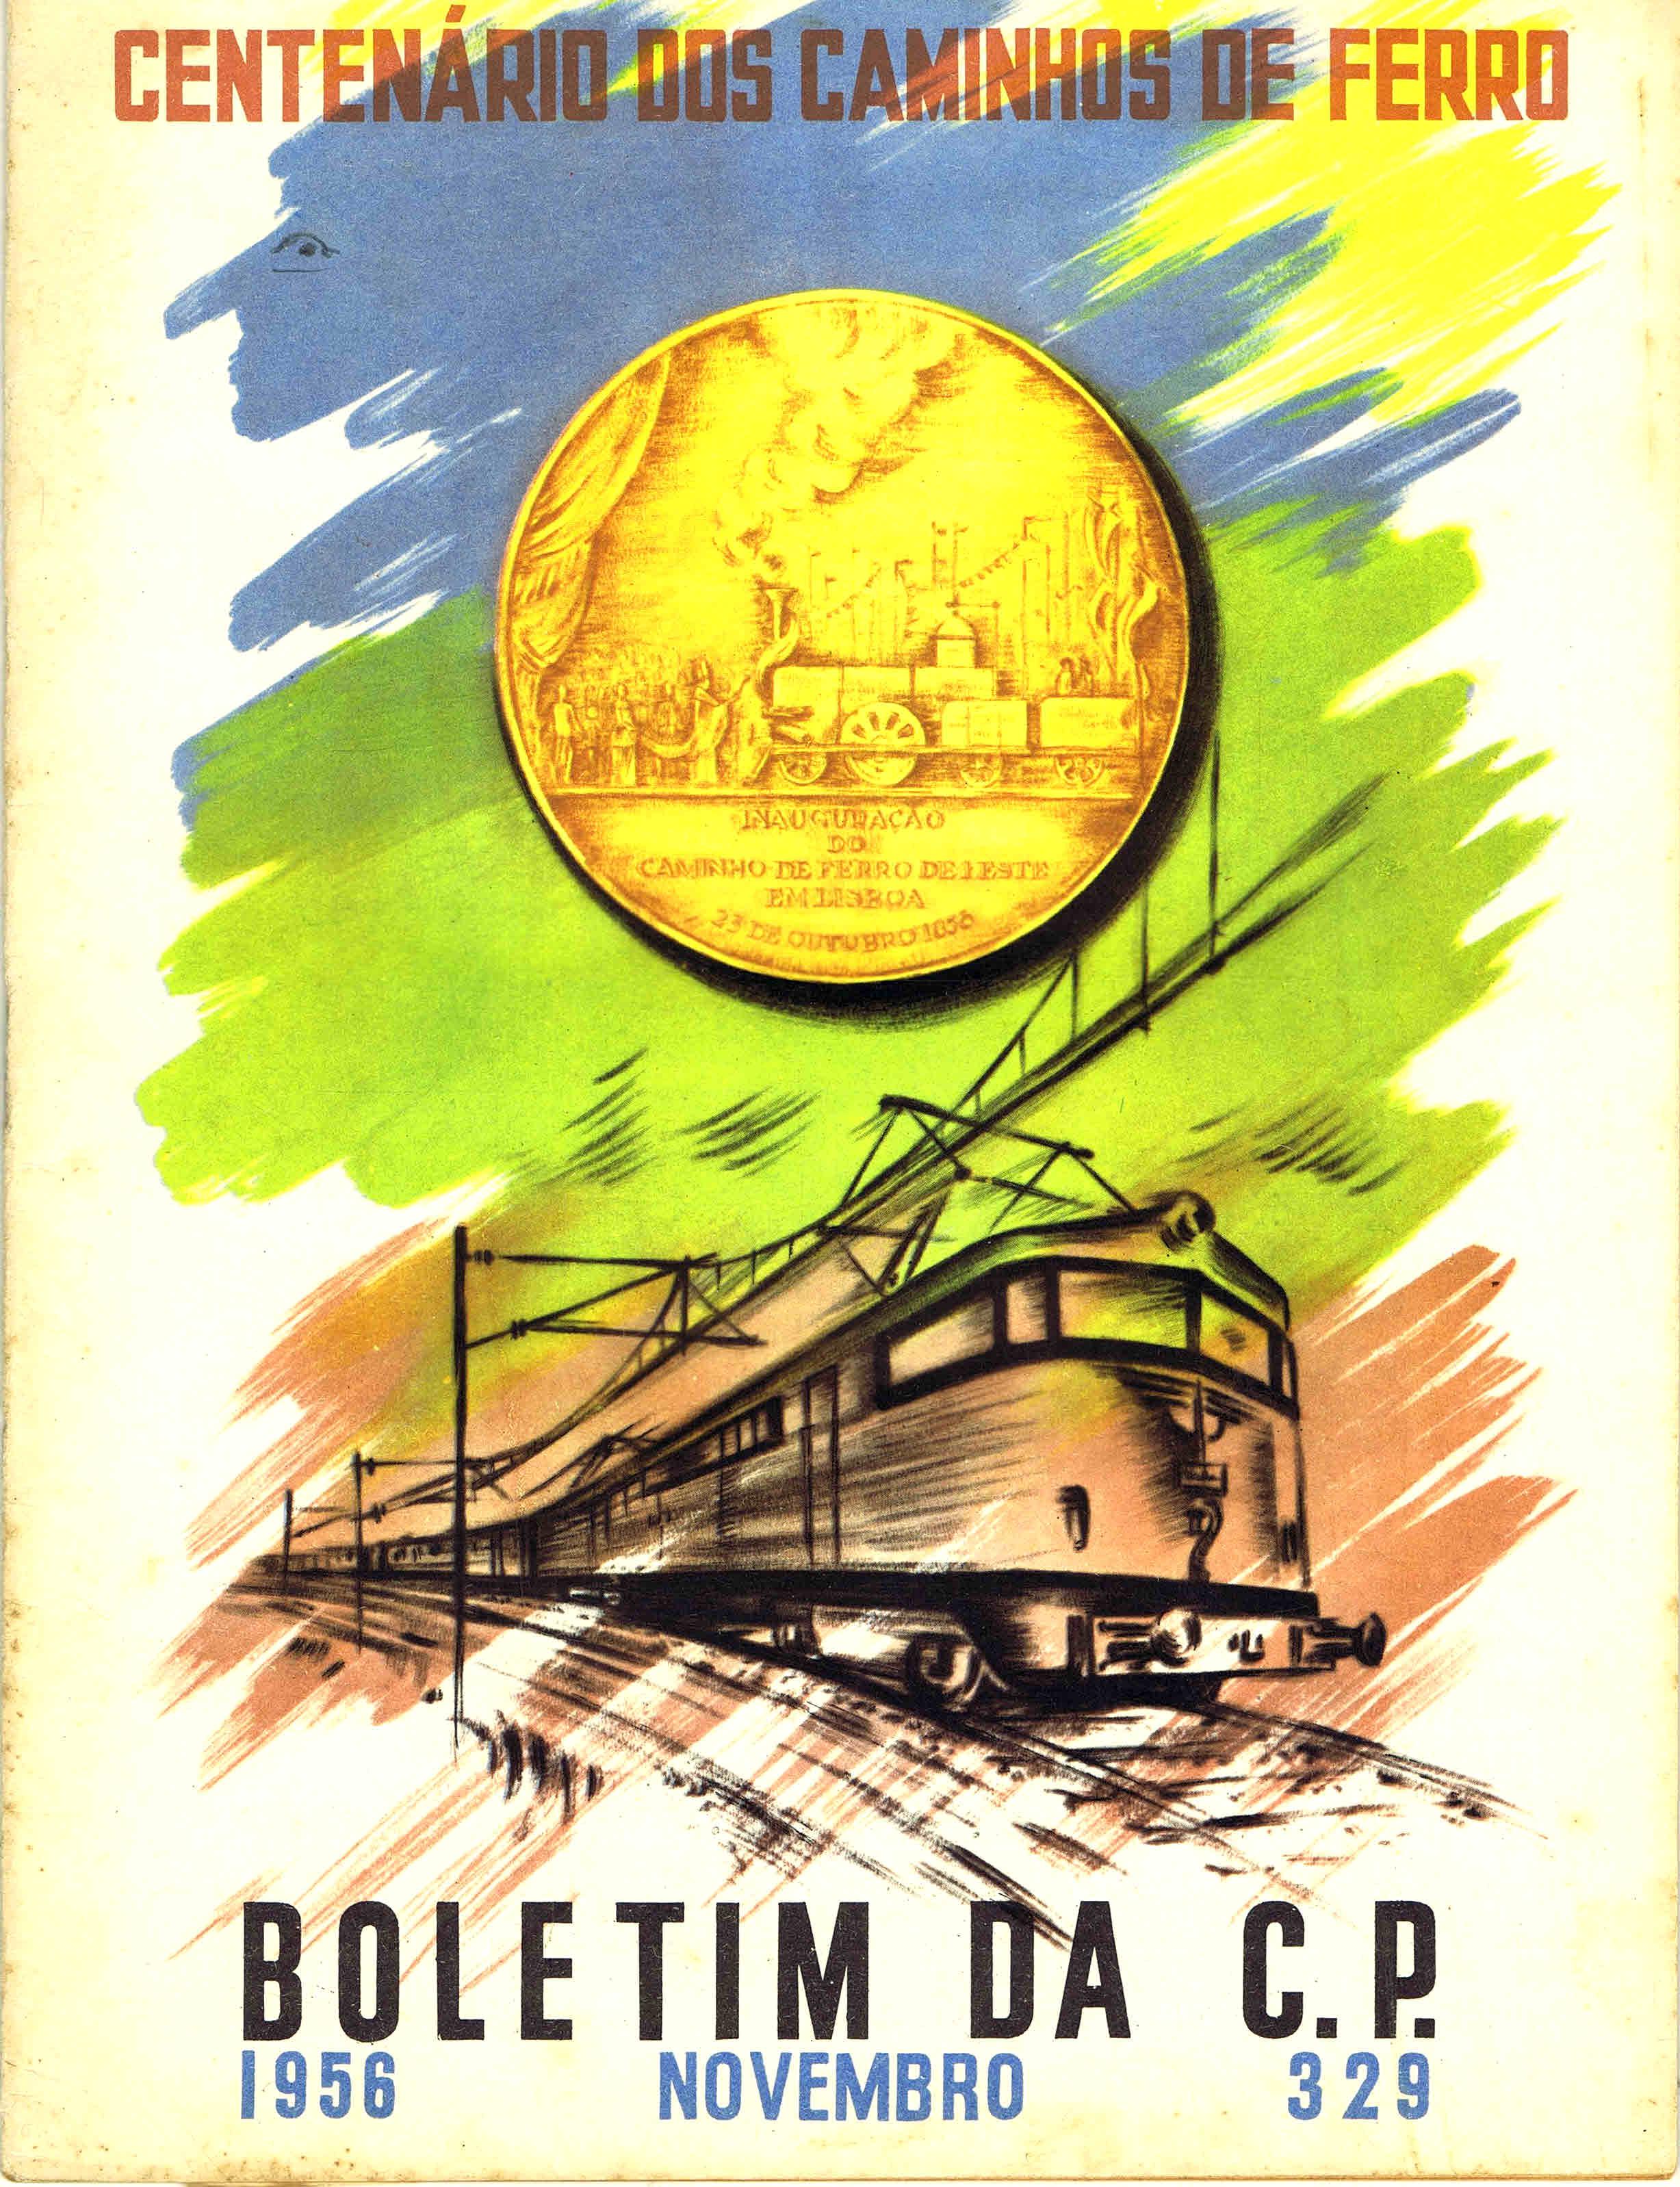 boletim da cp nº 329 novembro 1956